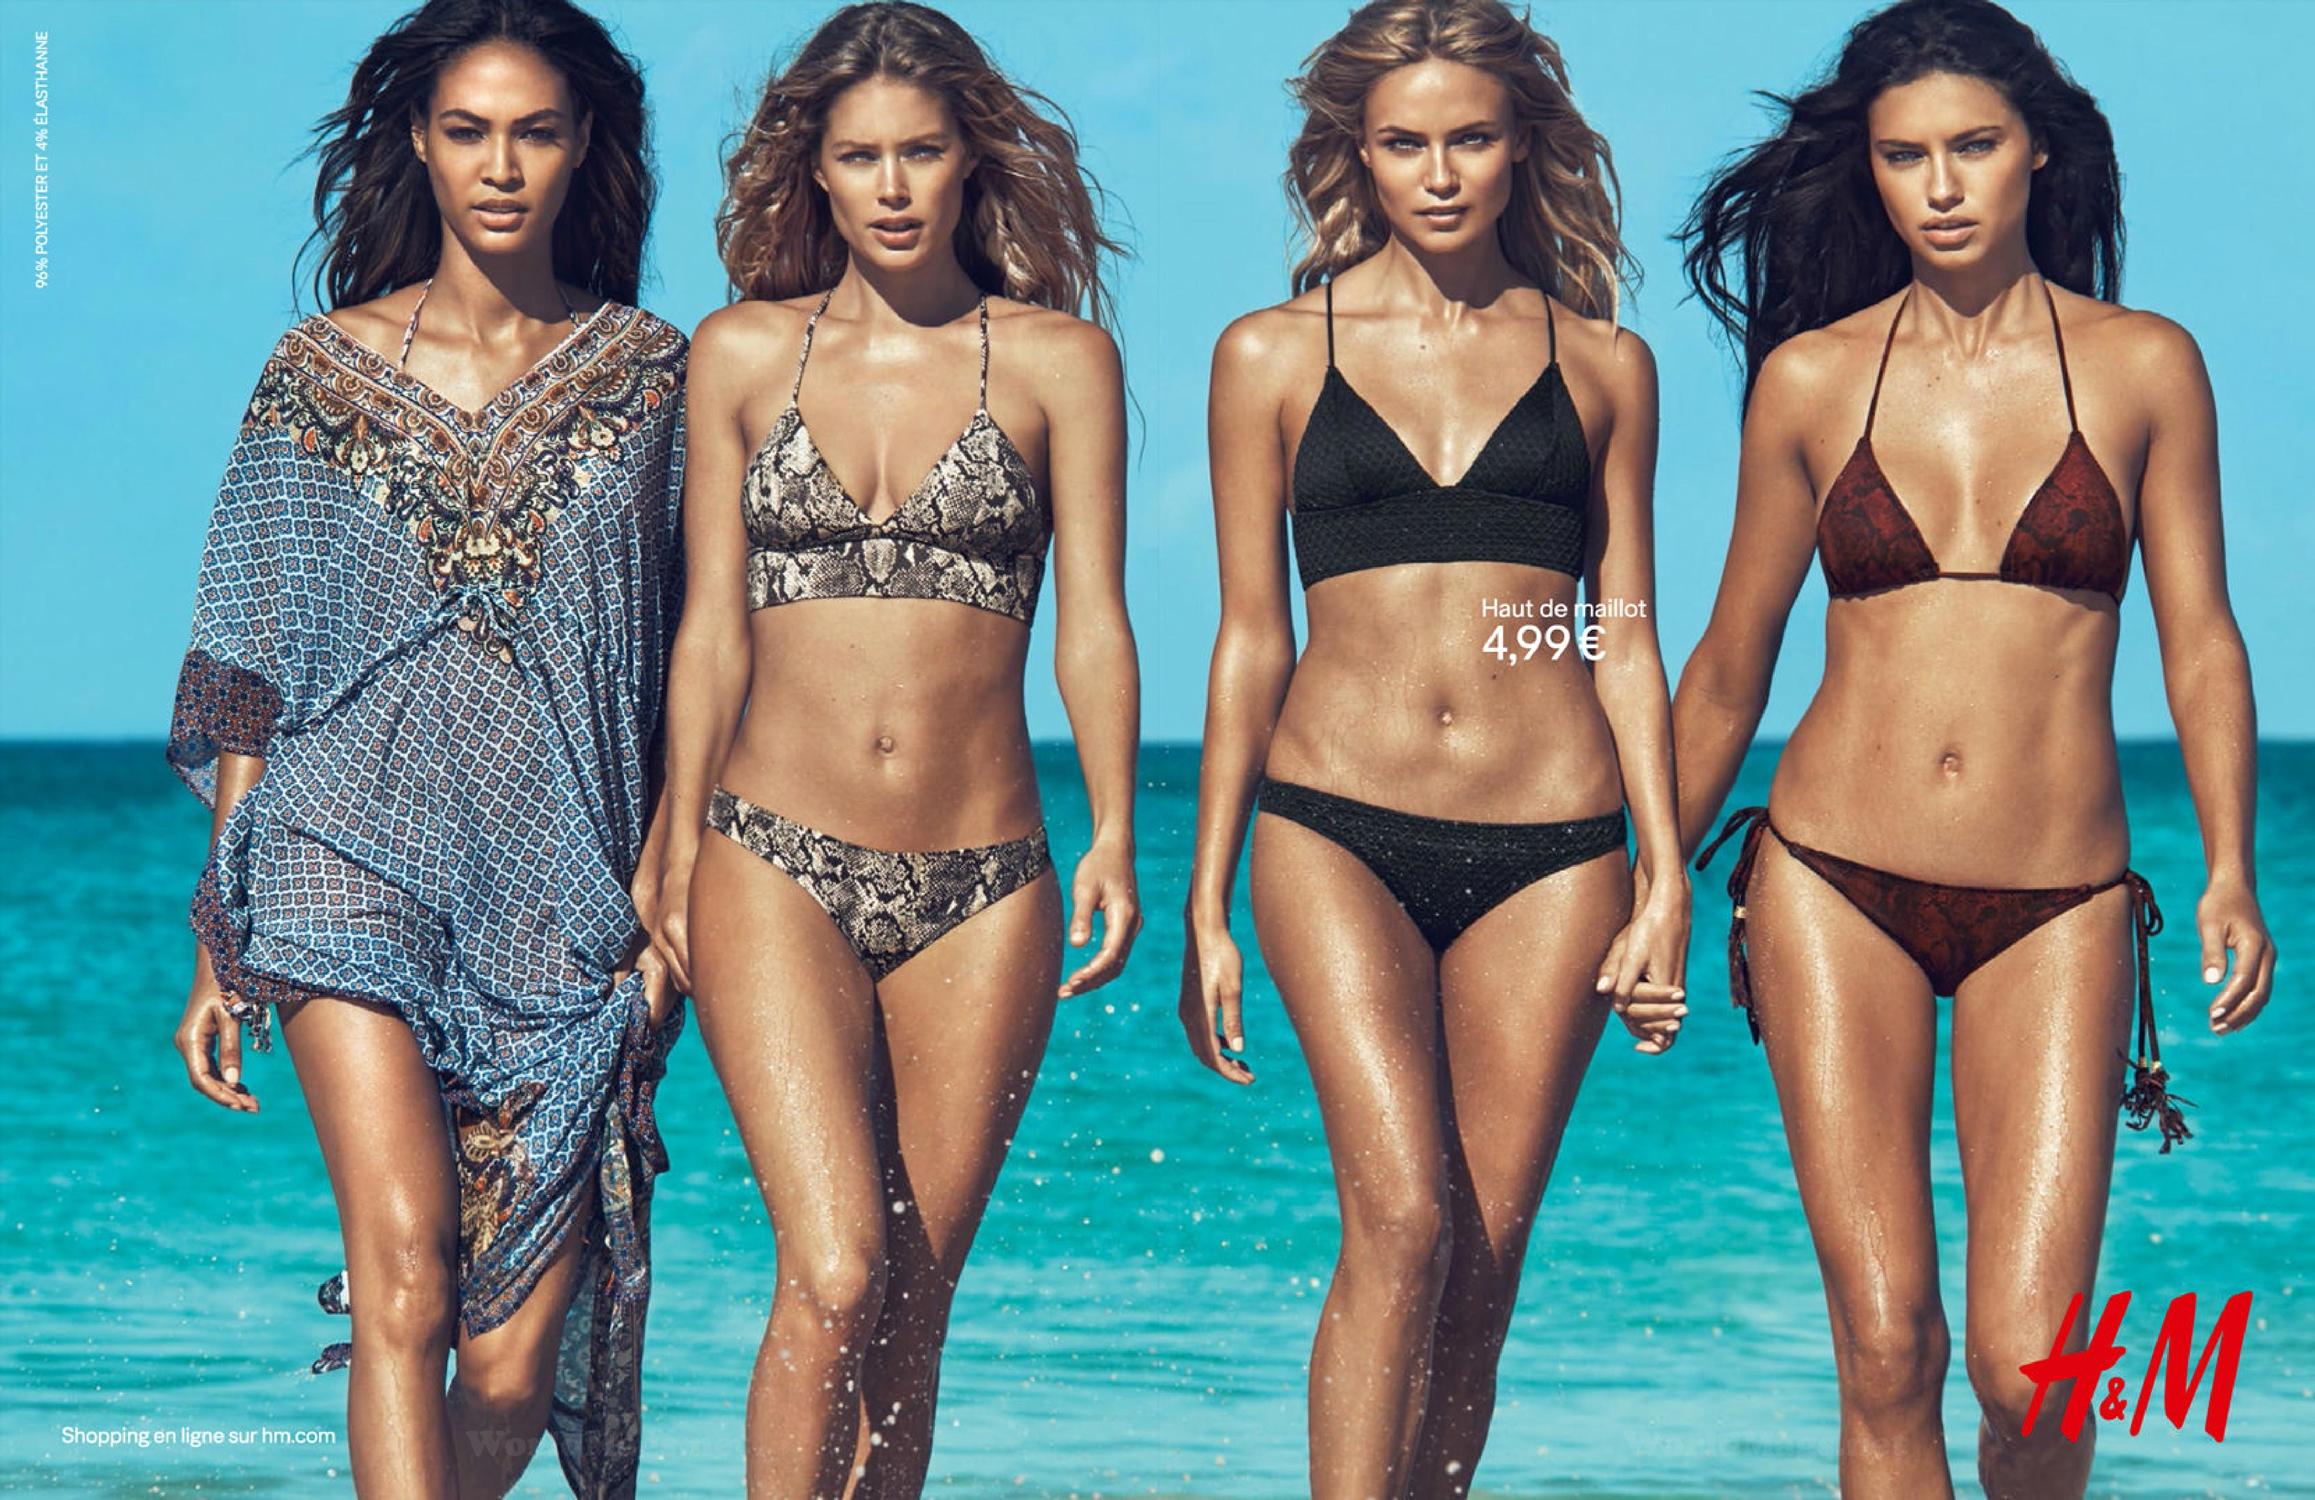 Swedish House Mafia Hd Wallpapers H Amp M Summer Ad Campaign The Impression